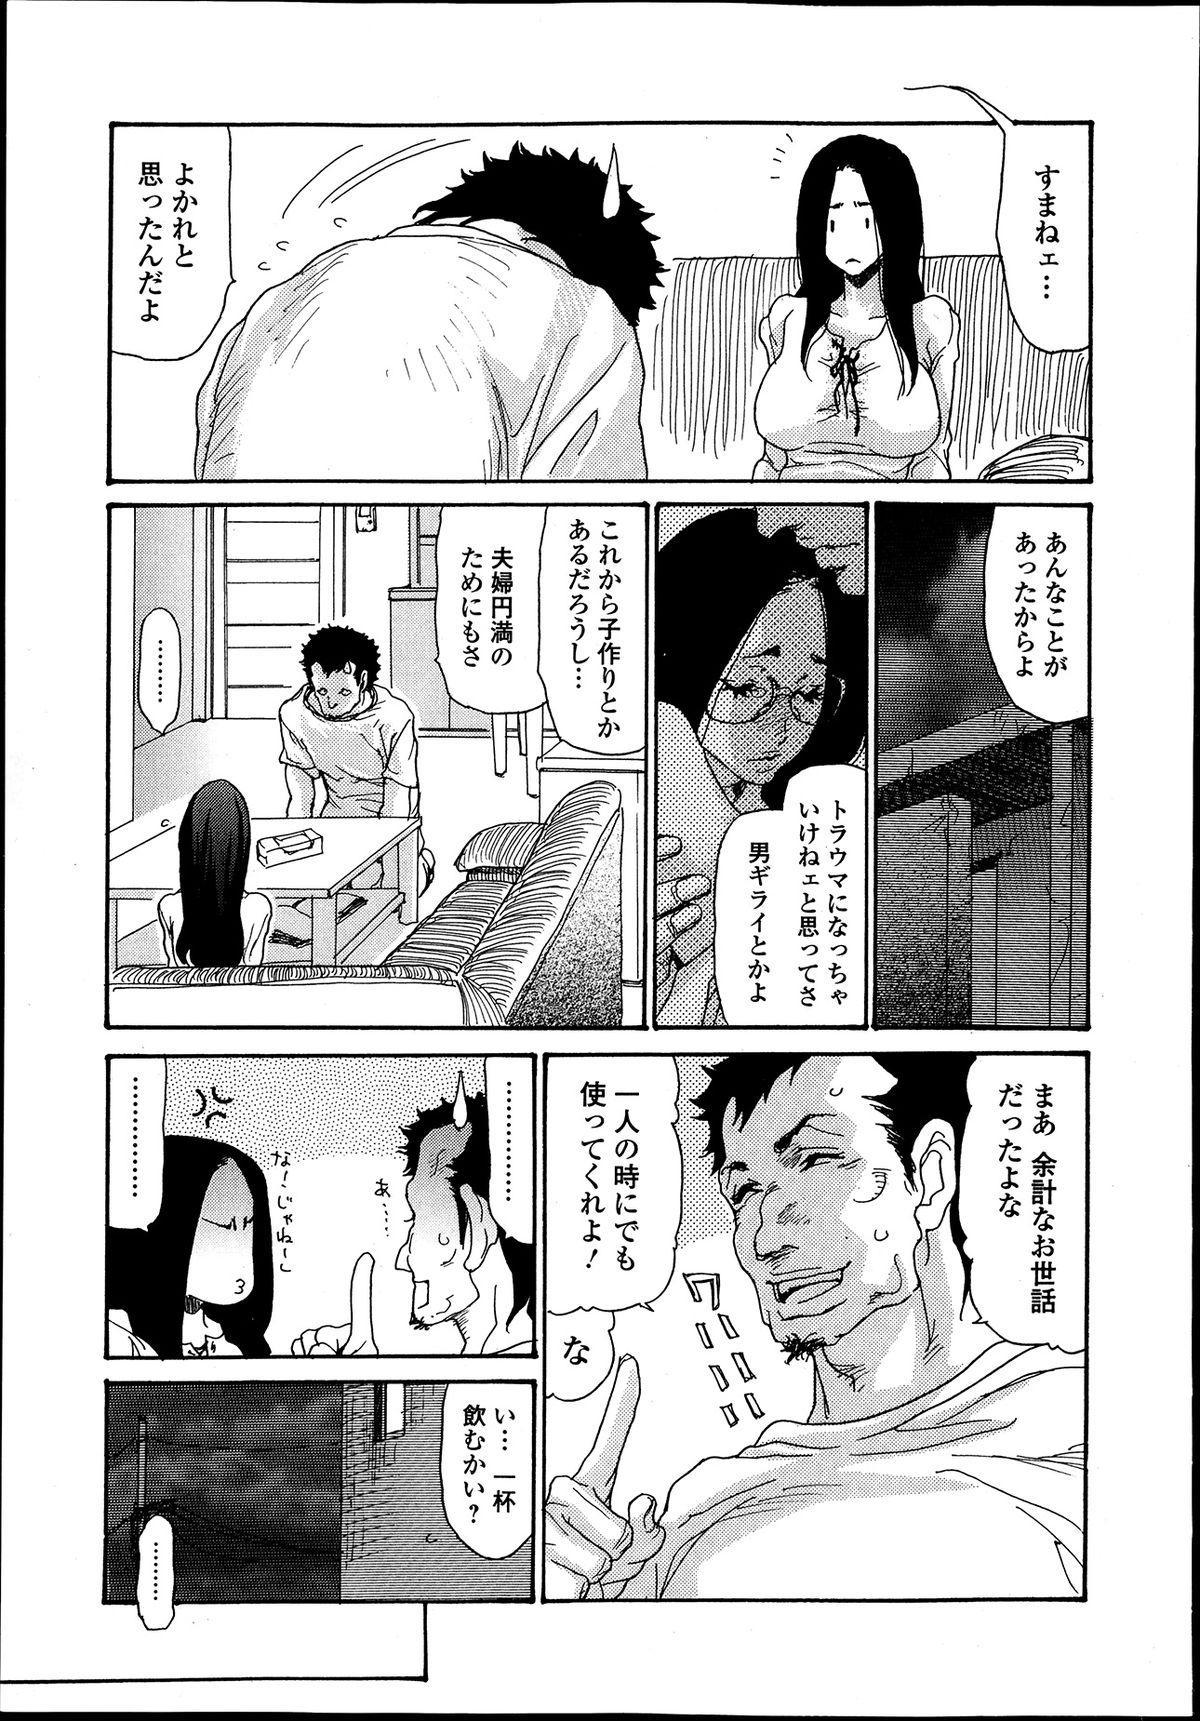 Bishoujo Kakumei KIWAME Road Vol.9 232